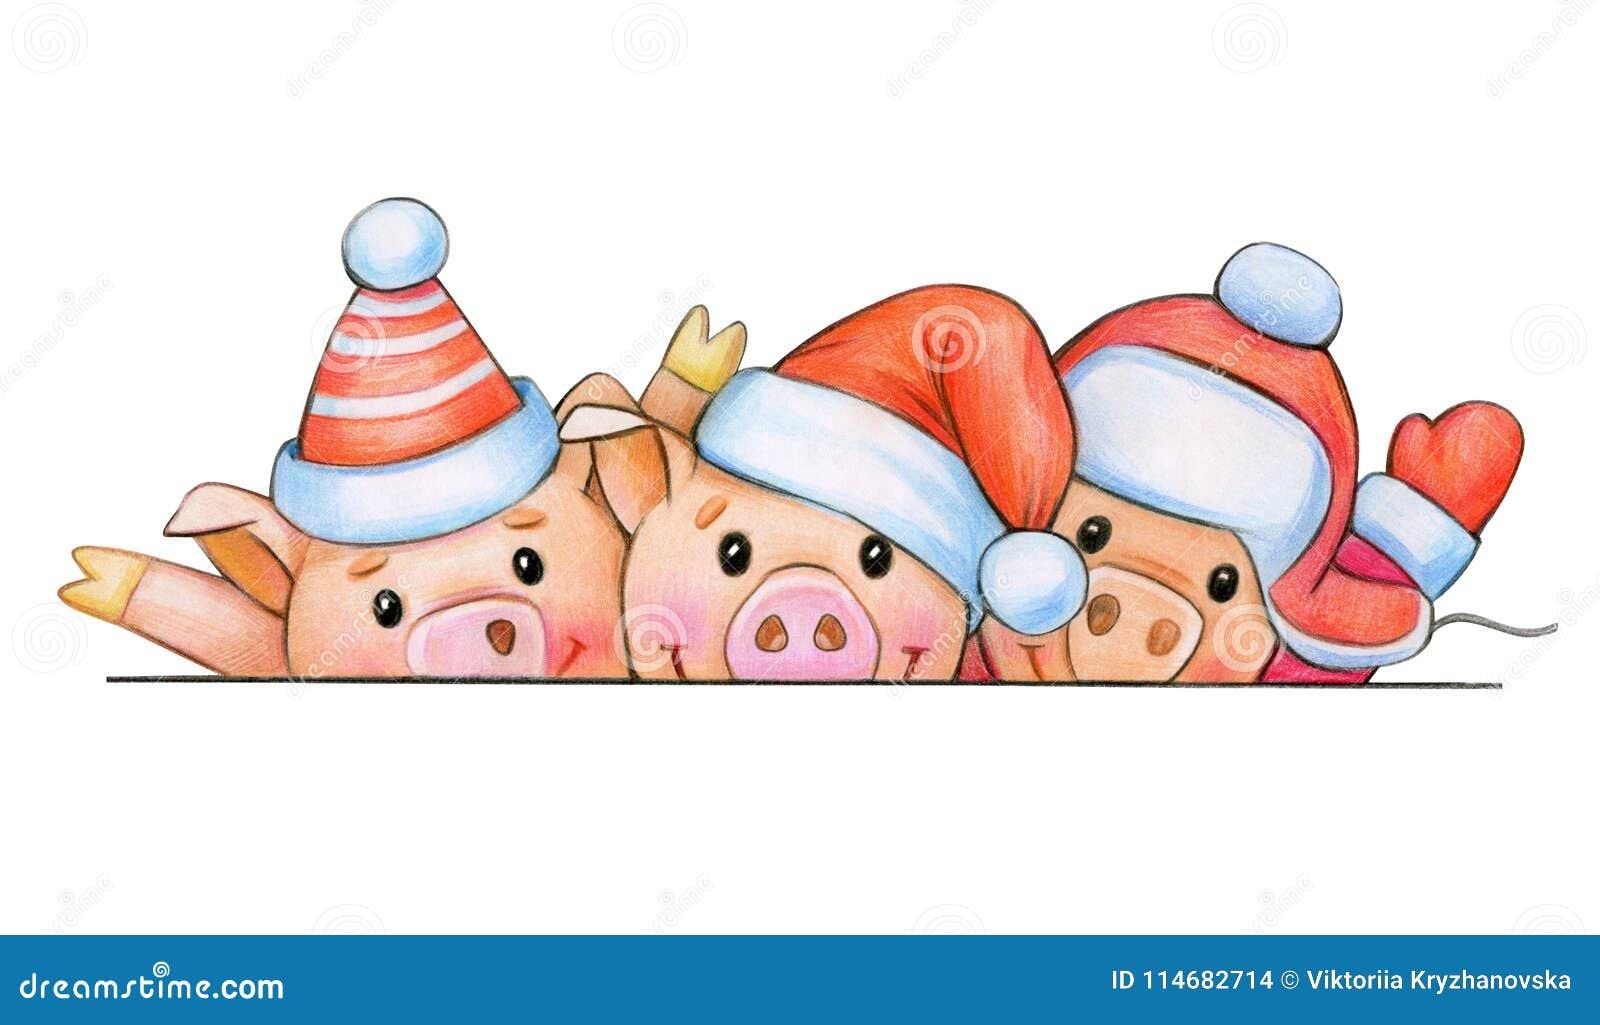 fun pig cartoons in christmas hats stock illustration